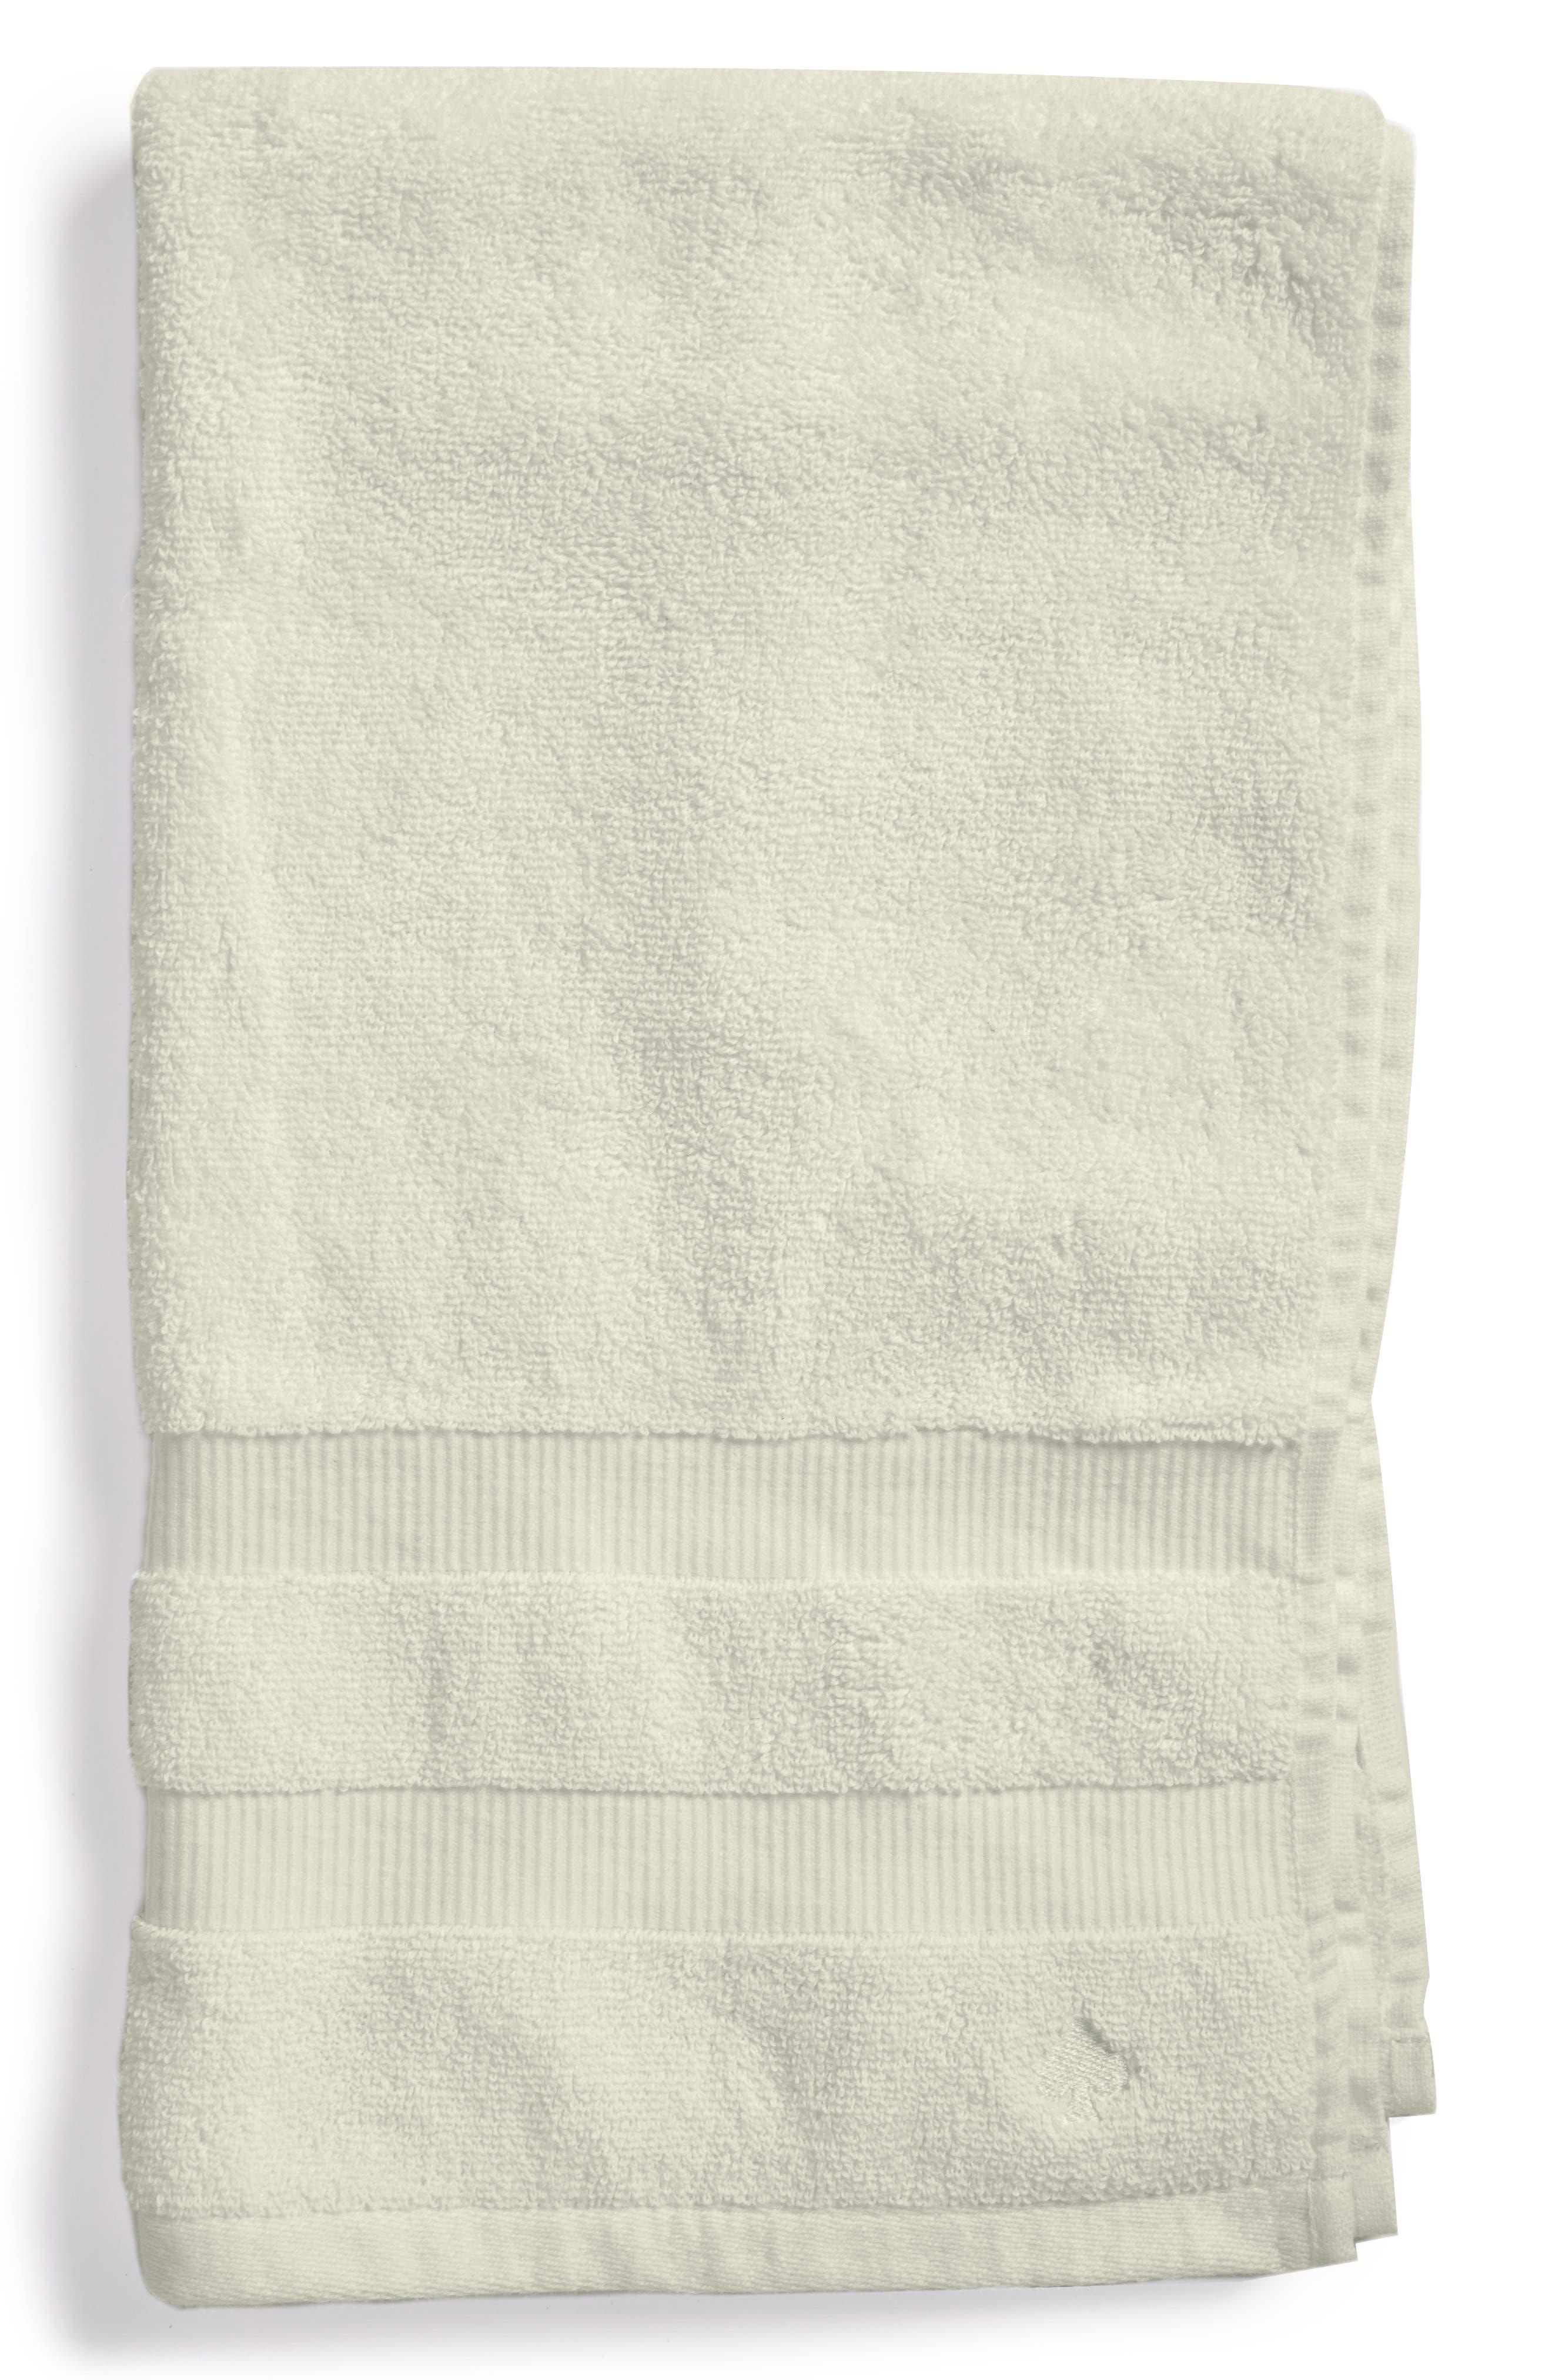 'chattam' stripe hand towel,                         Main,                         color, 040